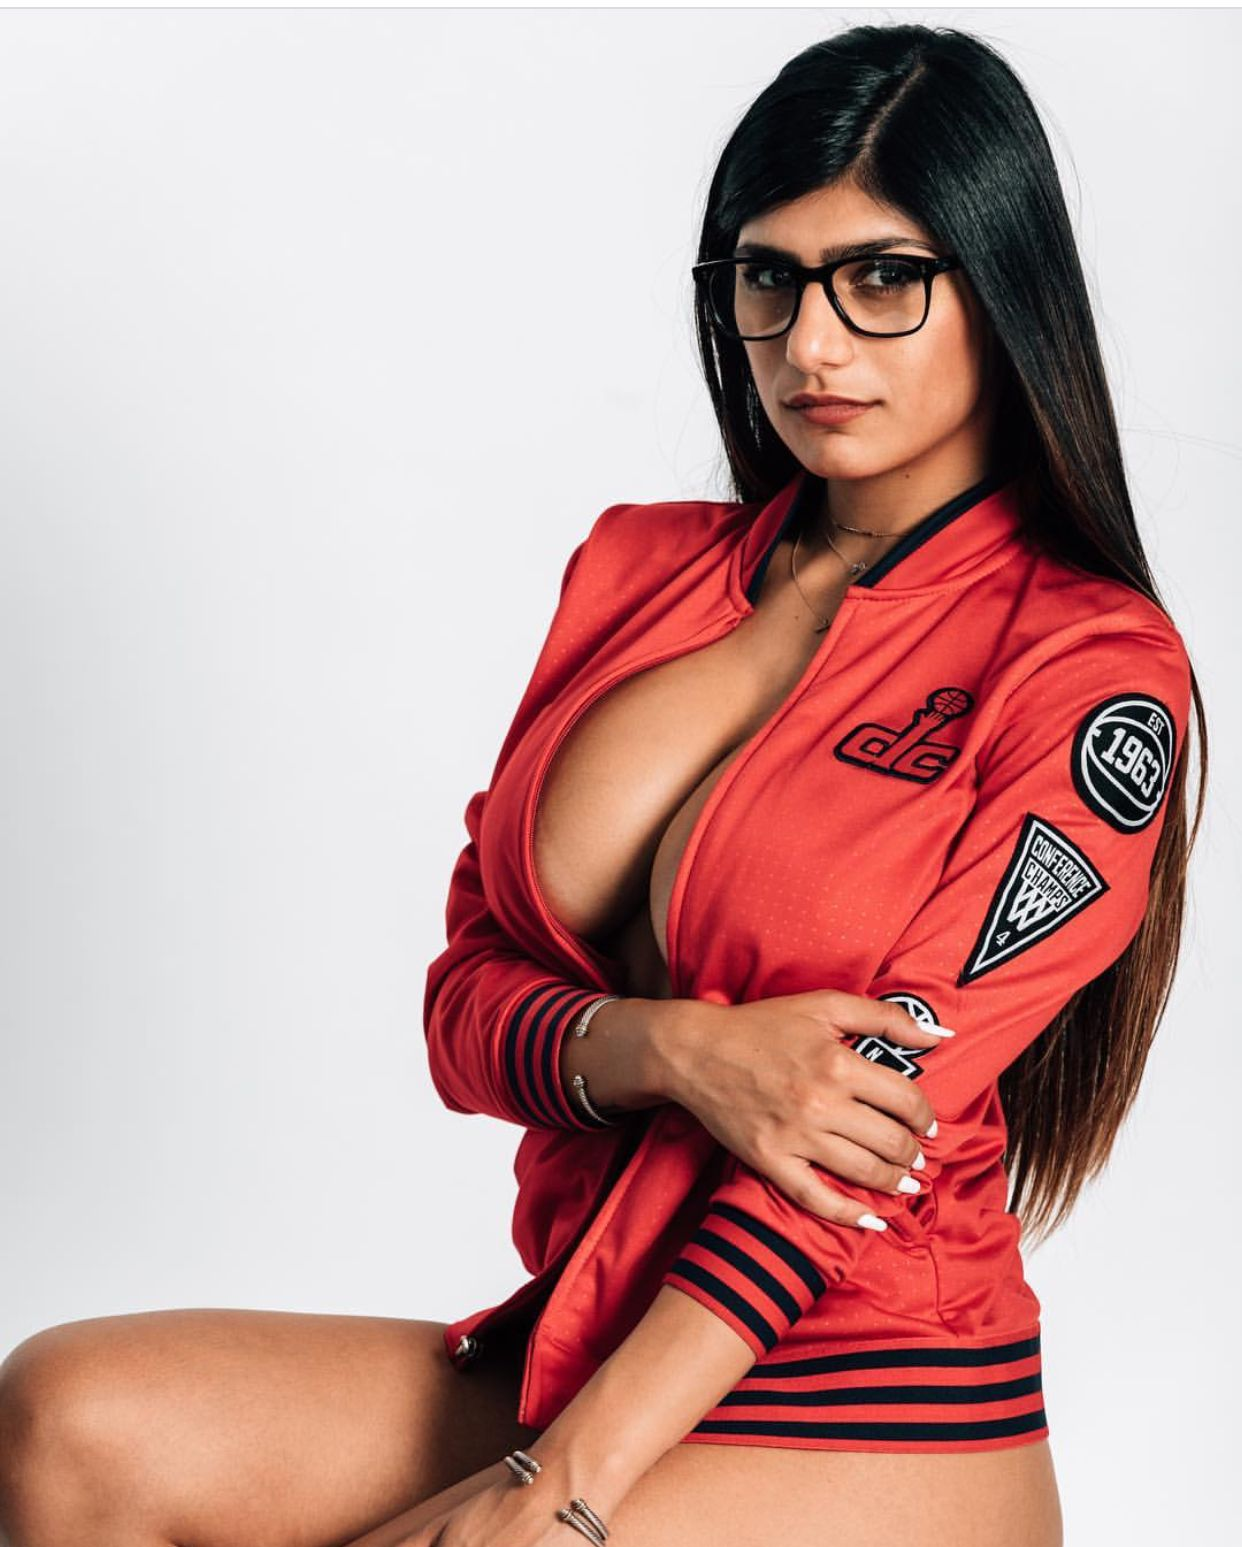 Sexy mia khalifa Mia Khalifa: